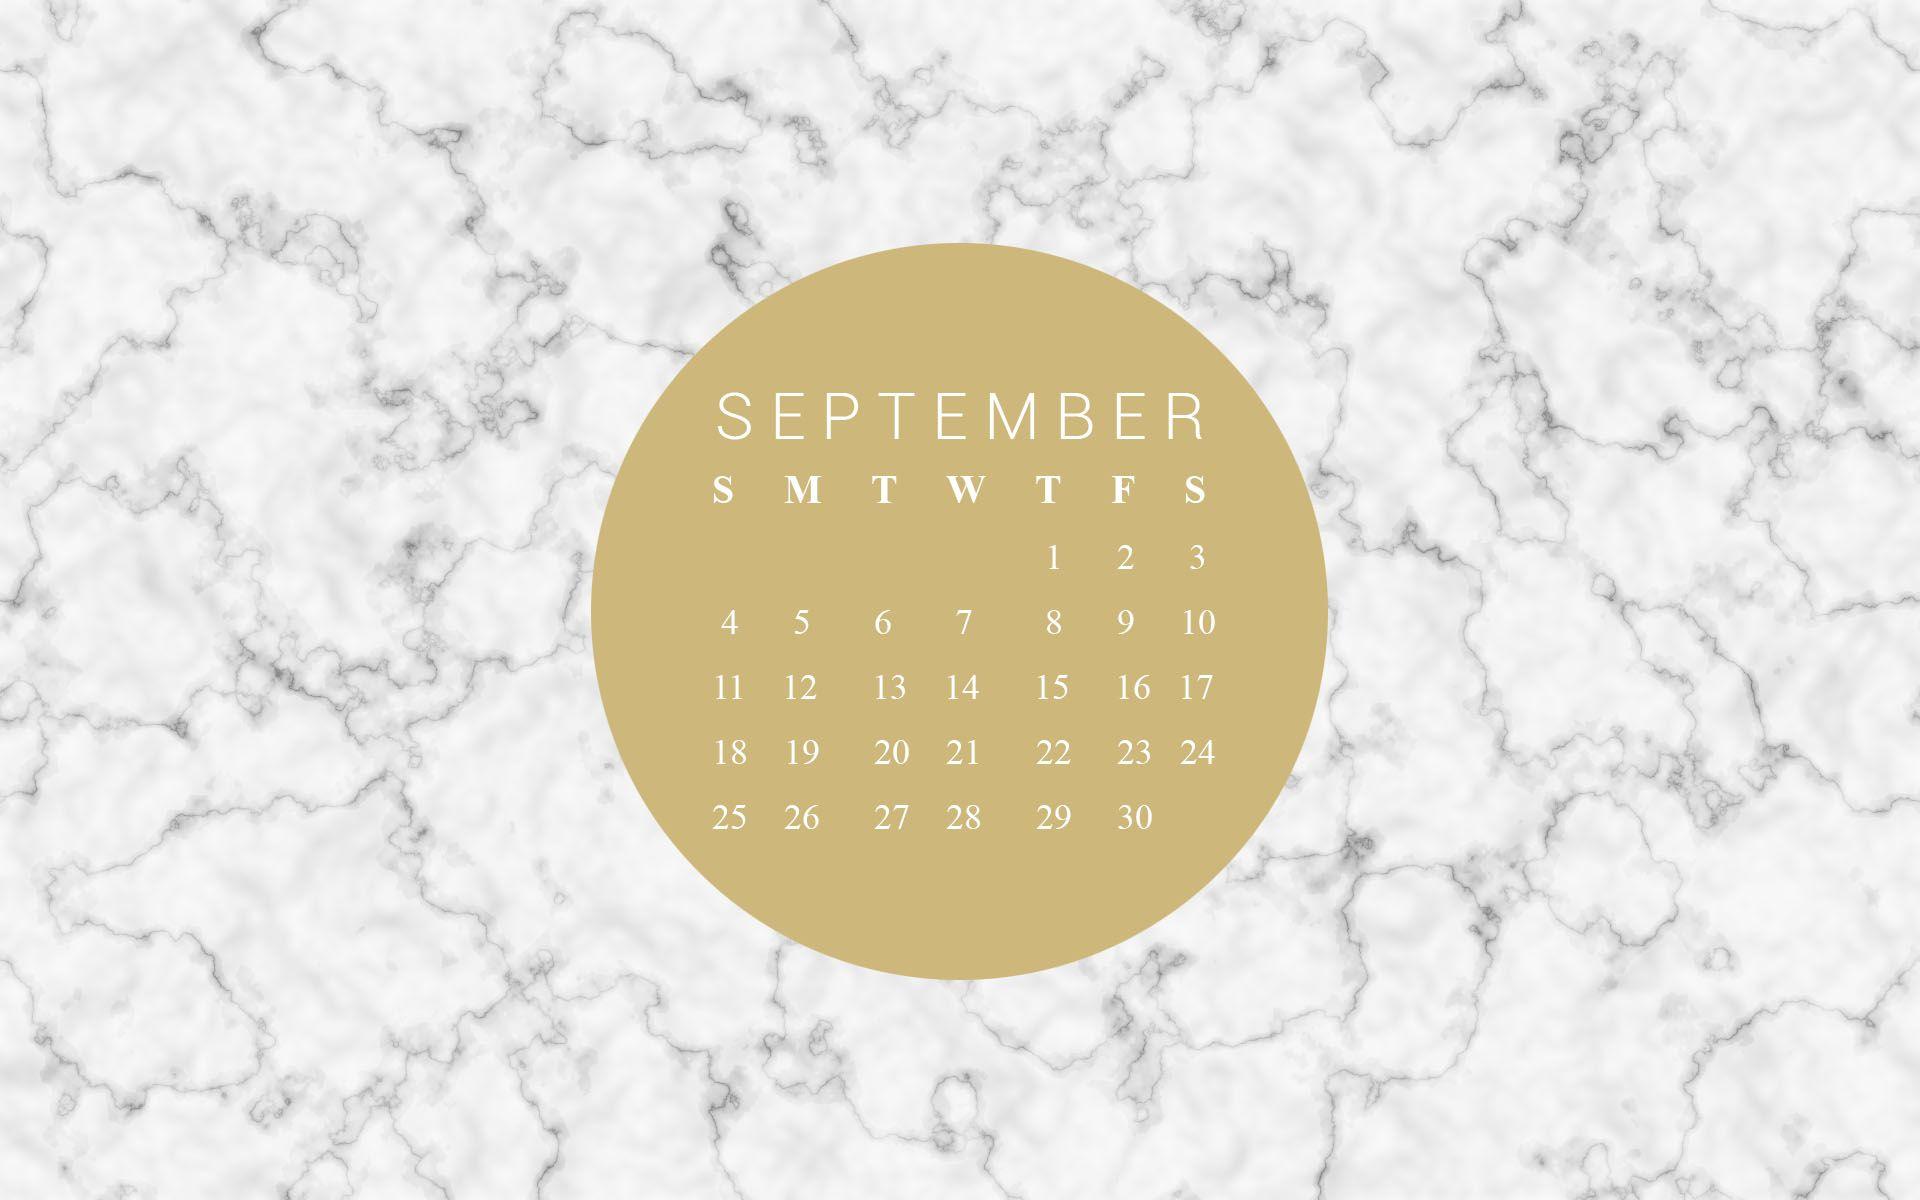 Free September Desktop Wallpaper Calendar Wallpaper September Wallpaper September Calendar